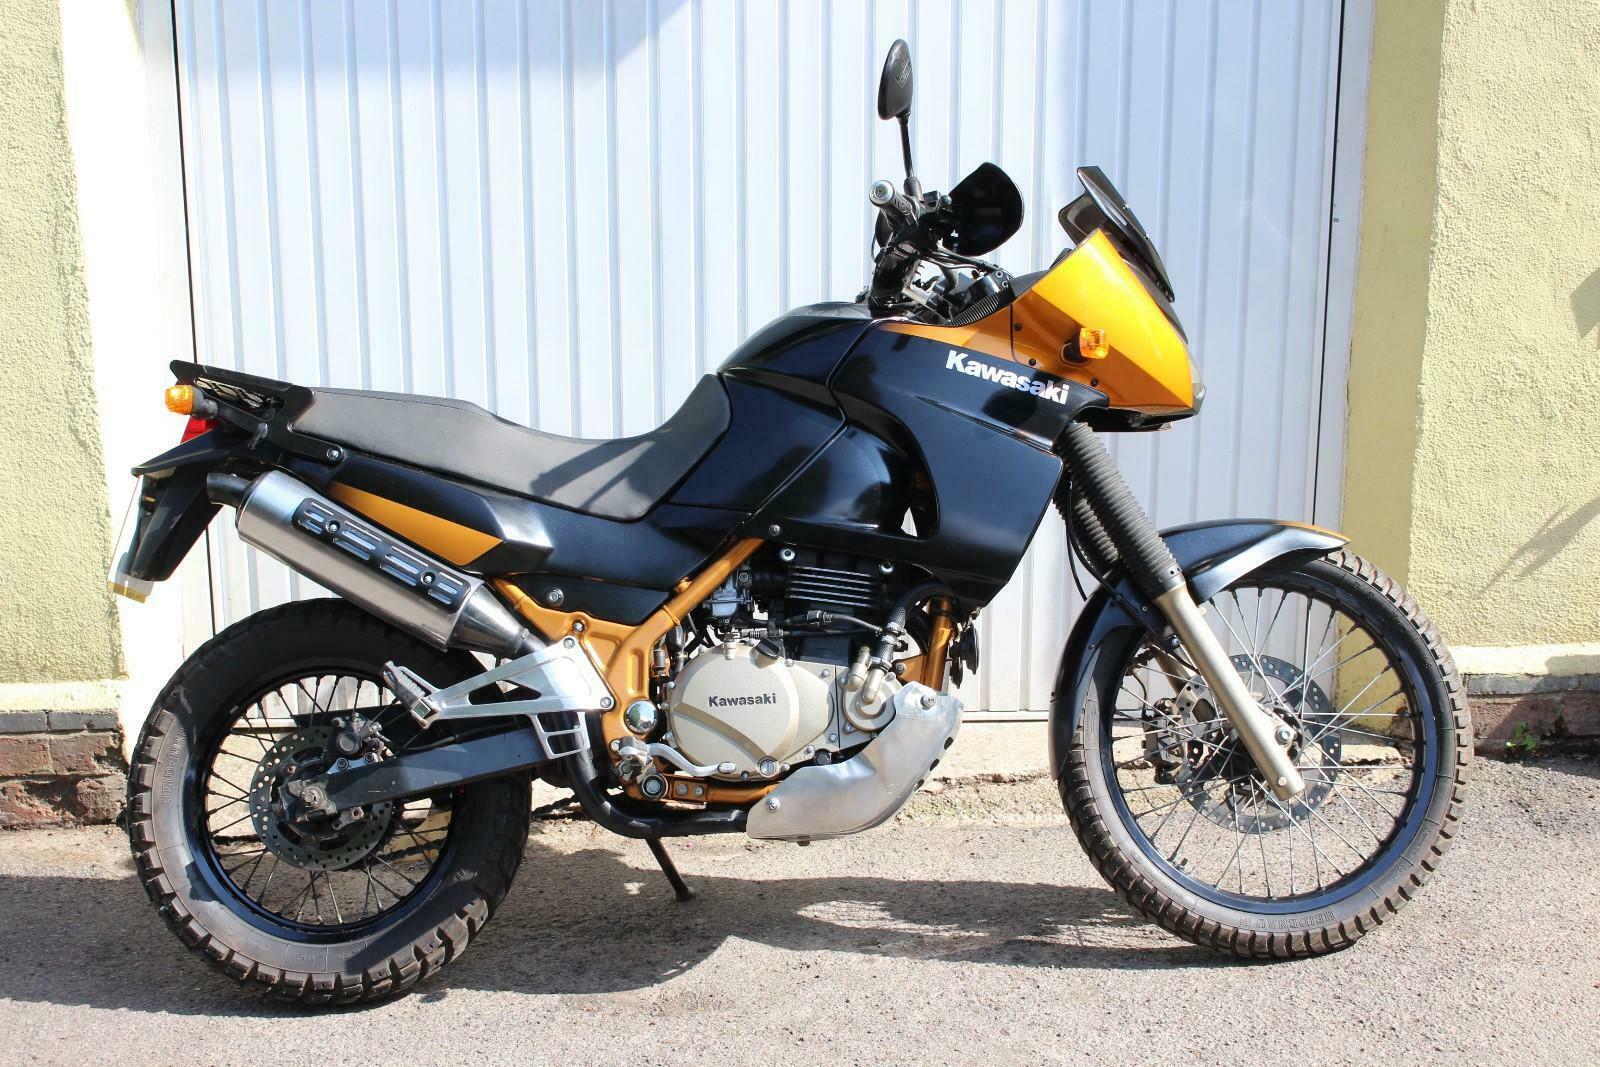 Kawasaki 650 Versys project bike  